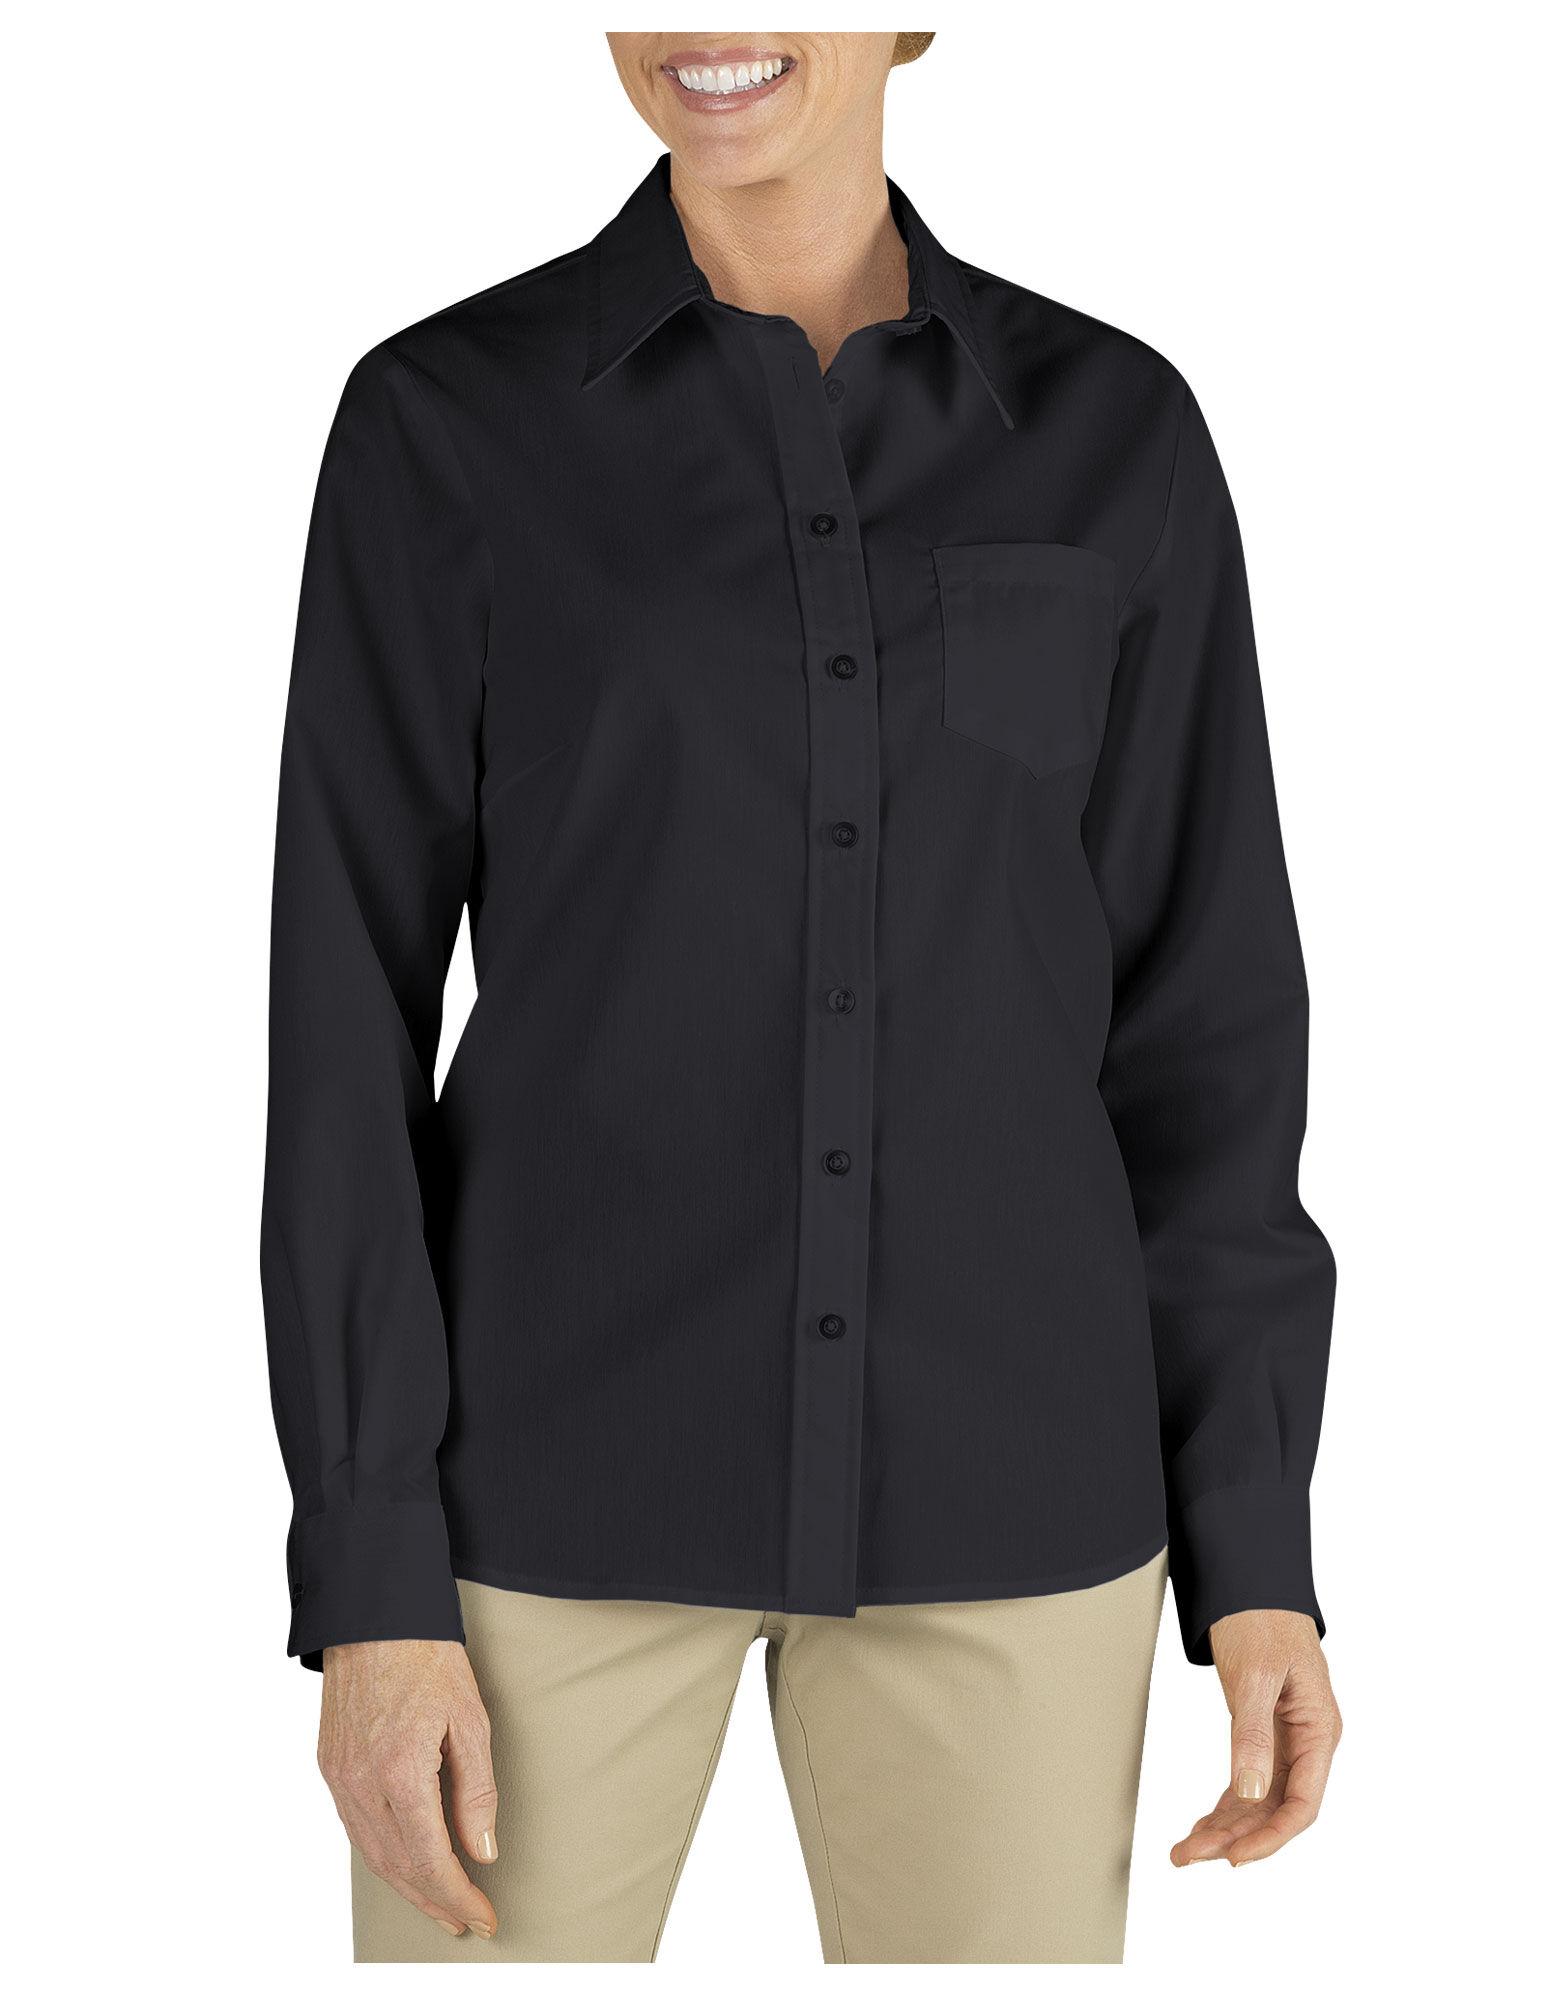 Women 39 s long sleeve work shirt dickies for Long sleeve poplin shirt